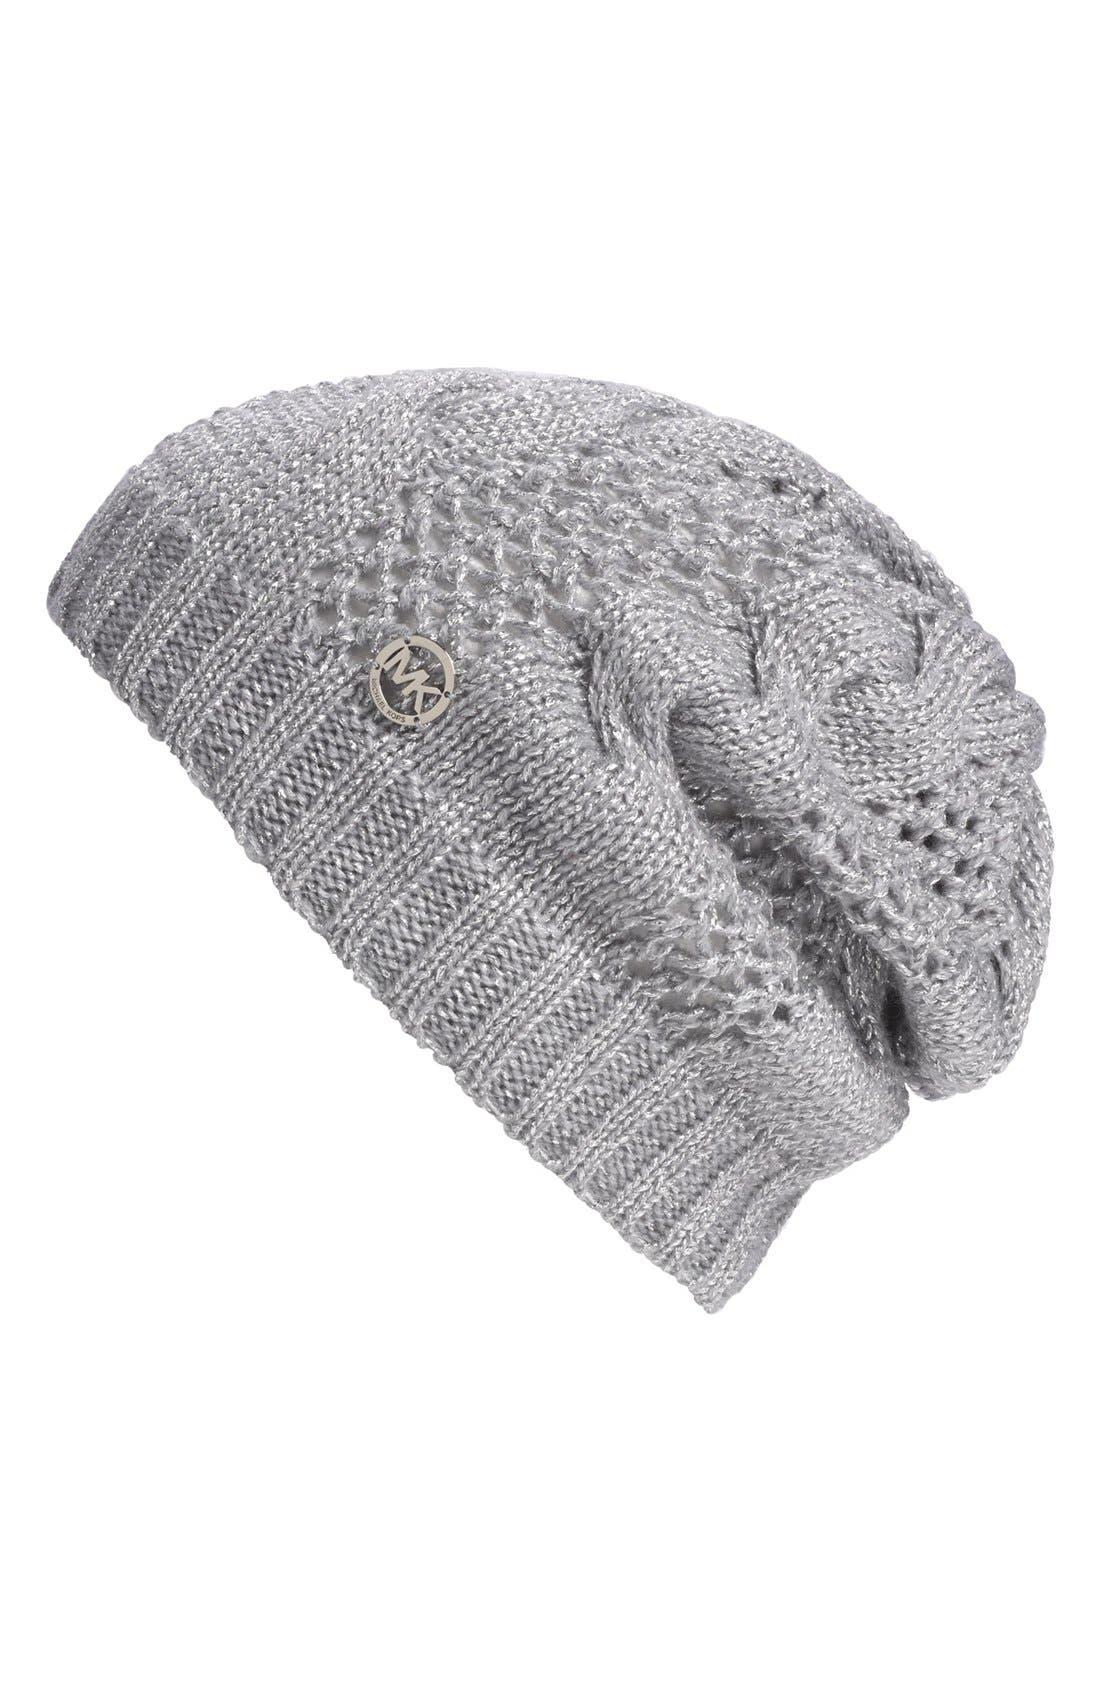 Main Image - MICHAEL Michael Kors Metallic Knit Beanie